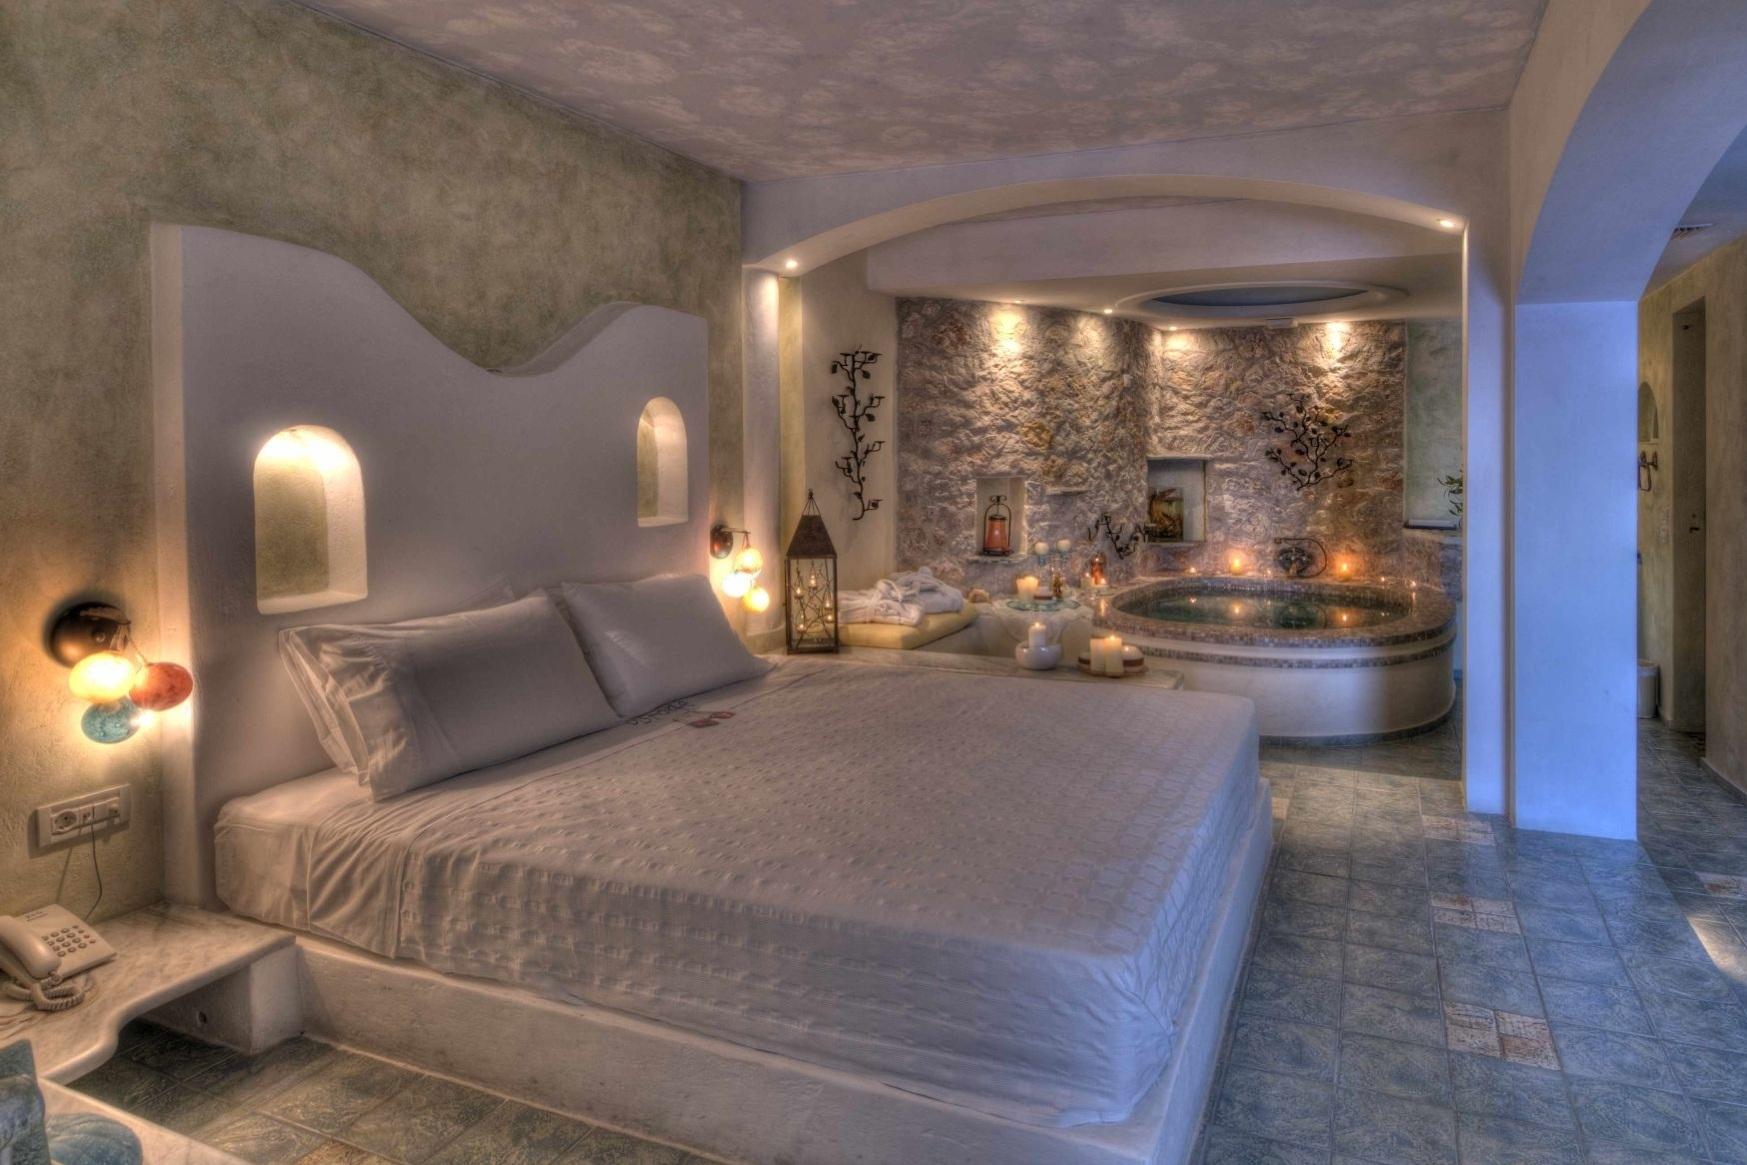 4_Honeymoon_suite_private_couples_Jacuzzi_sea_volcano_caldera_views_Astarte_Suites_Santorini_island.jpg